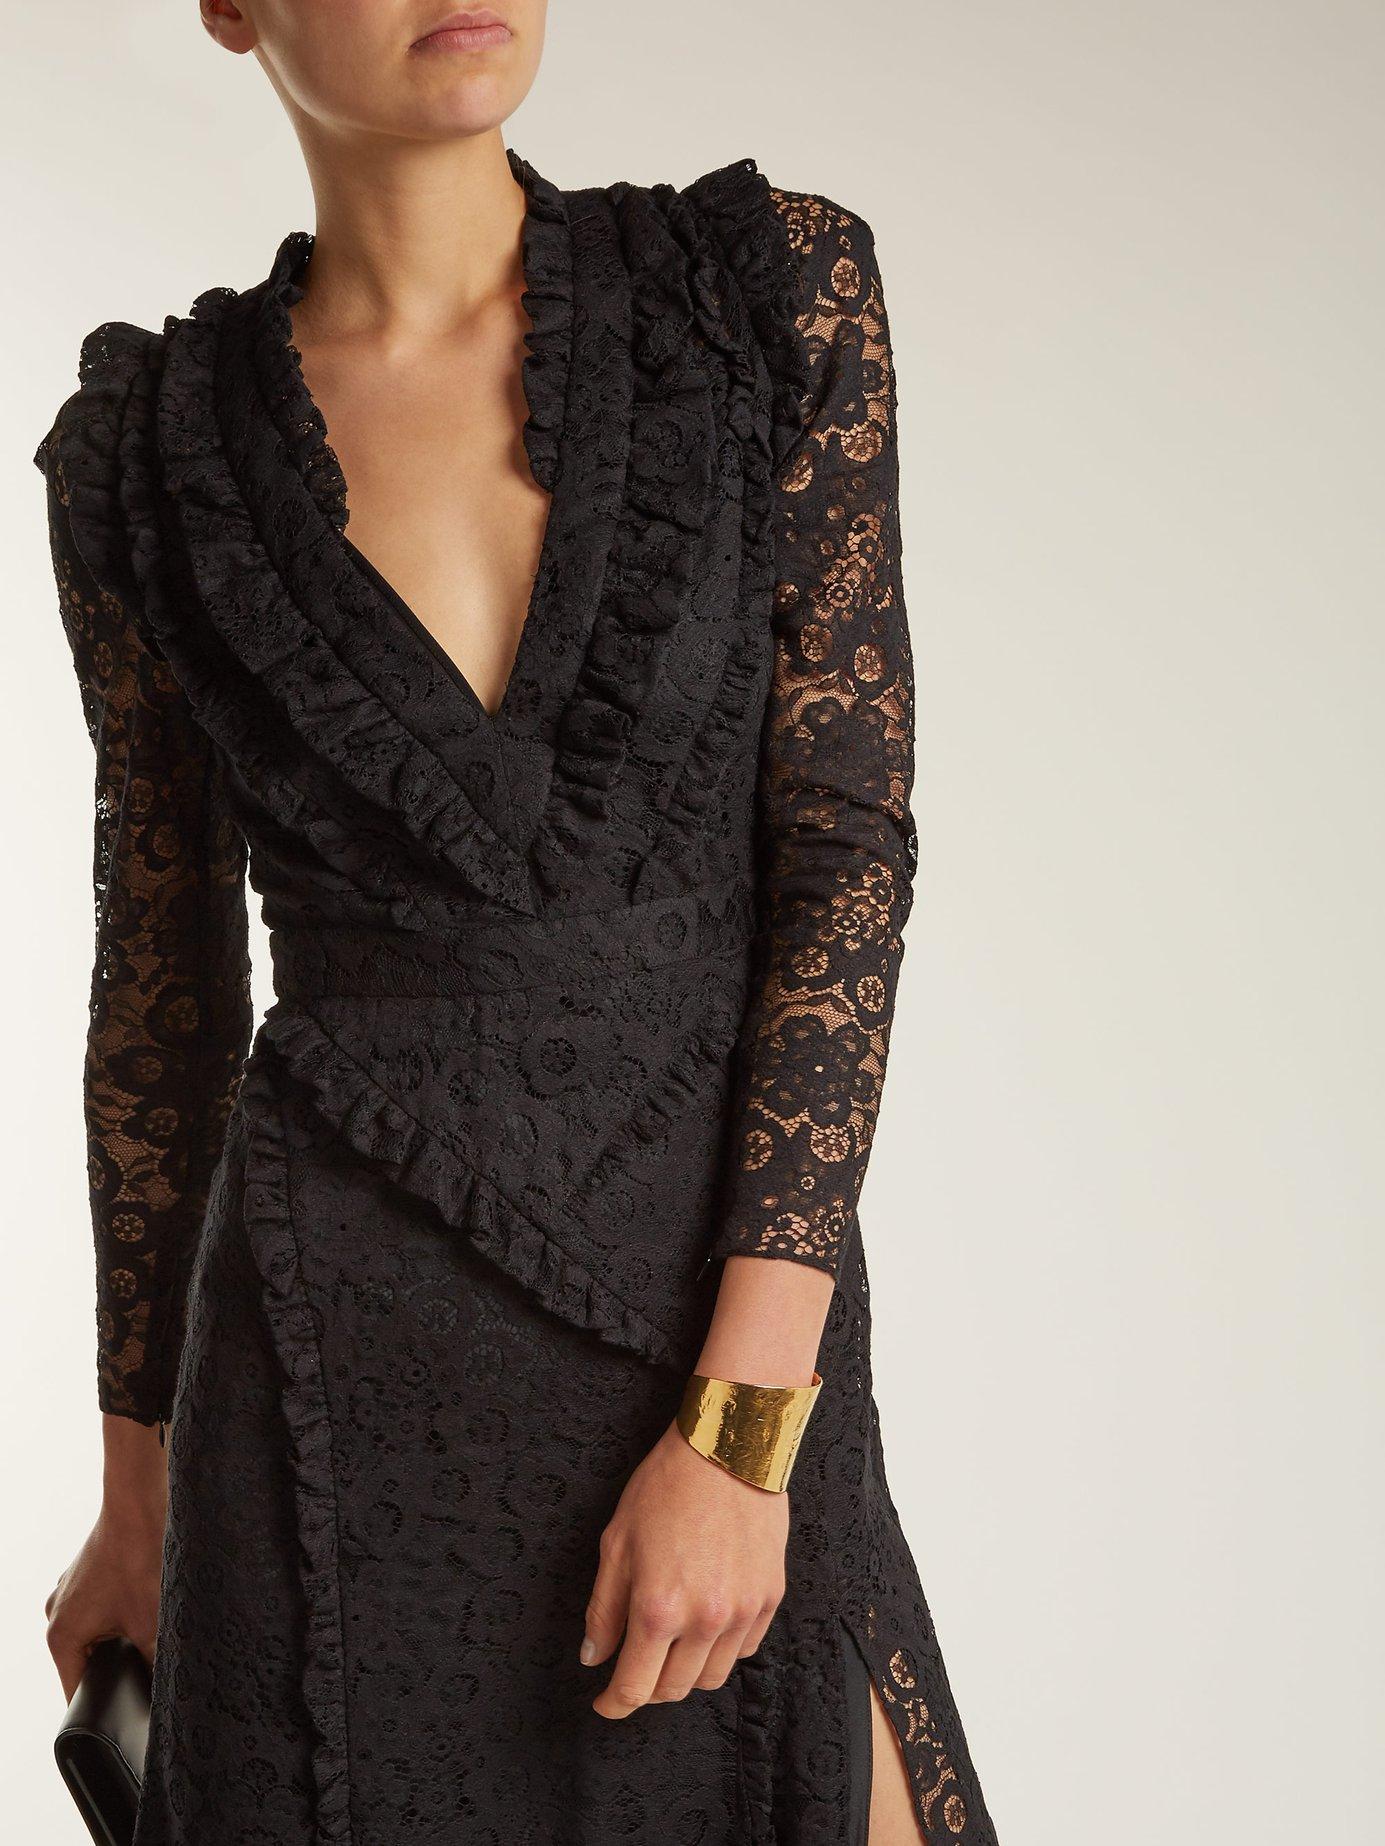 Ourika Valencienne lace ruffle-trimmed dress by Altuzarra